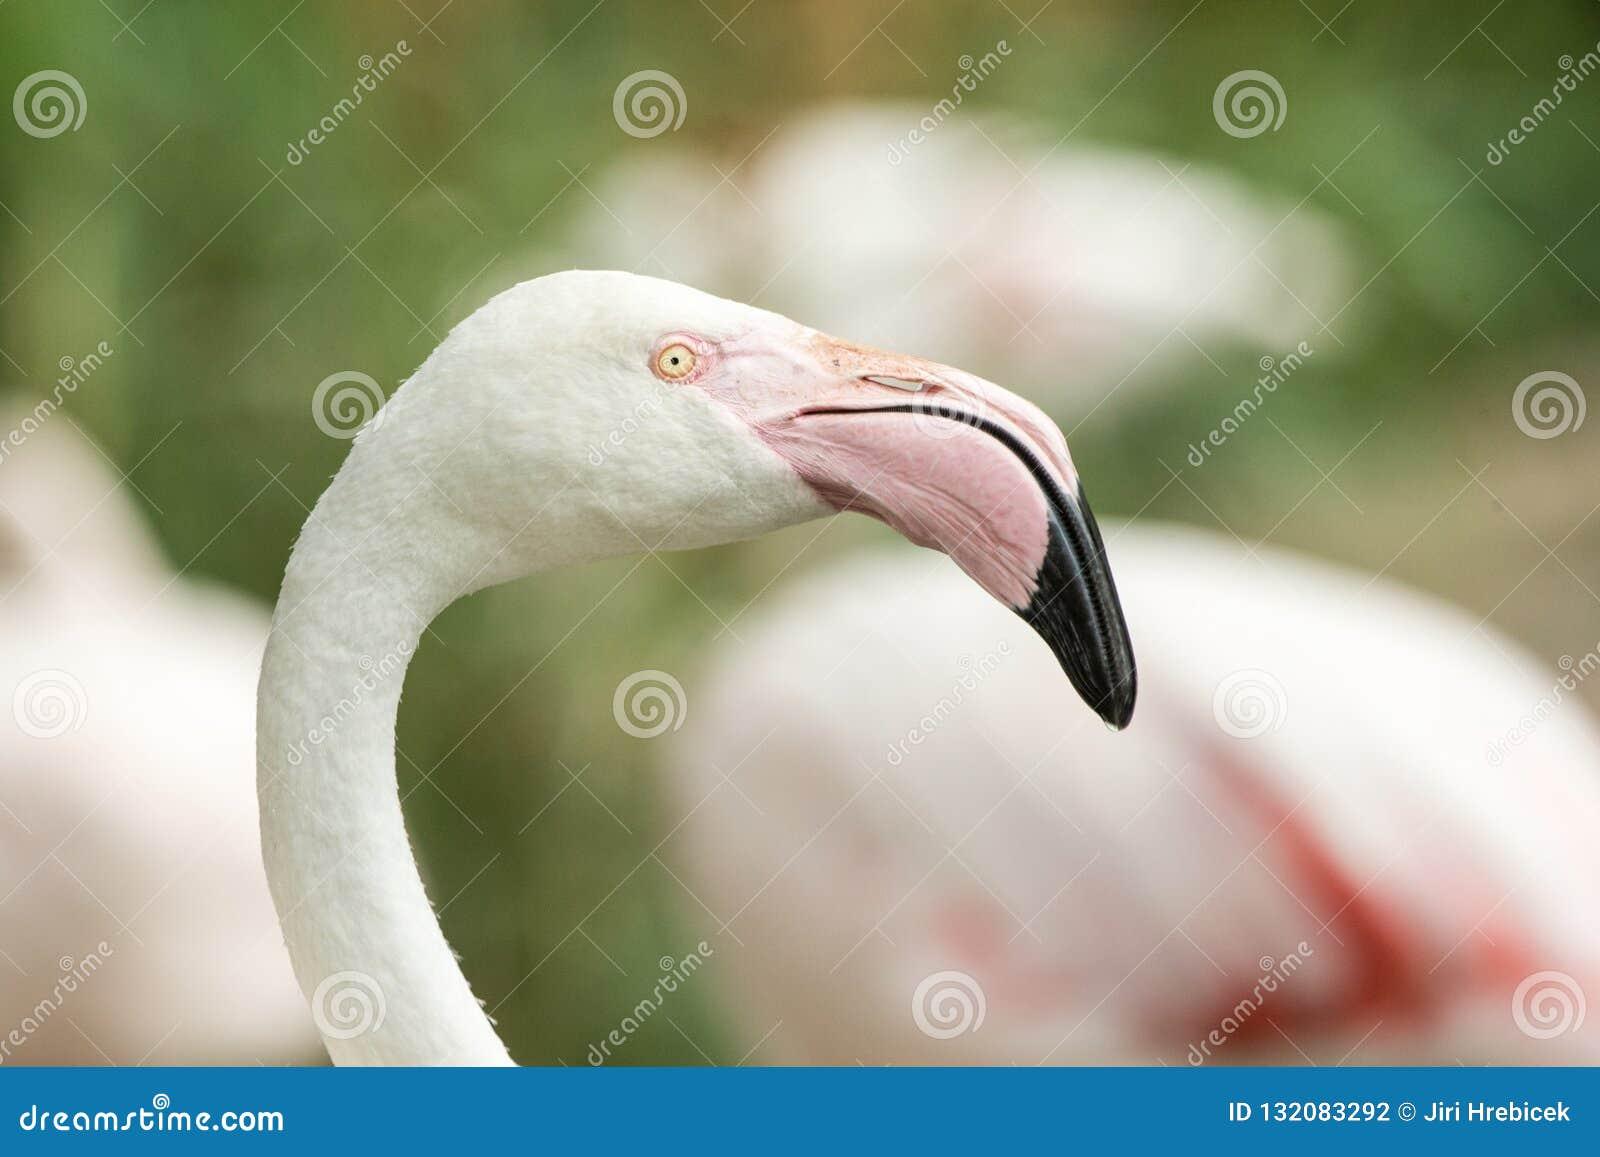 Rosa flamingo på zoo, solo flamingoståendephoenicopterus, härlig vit rosaaktig fågel nära dammet